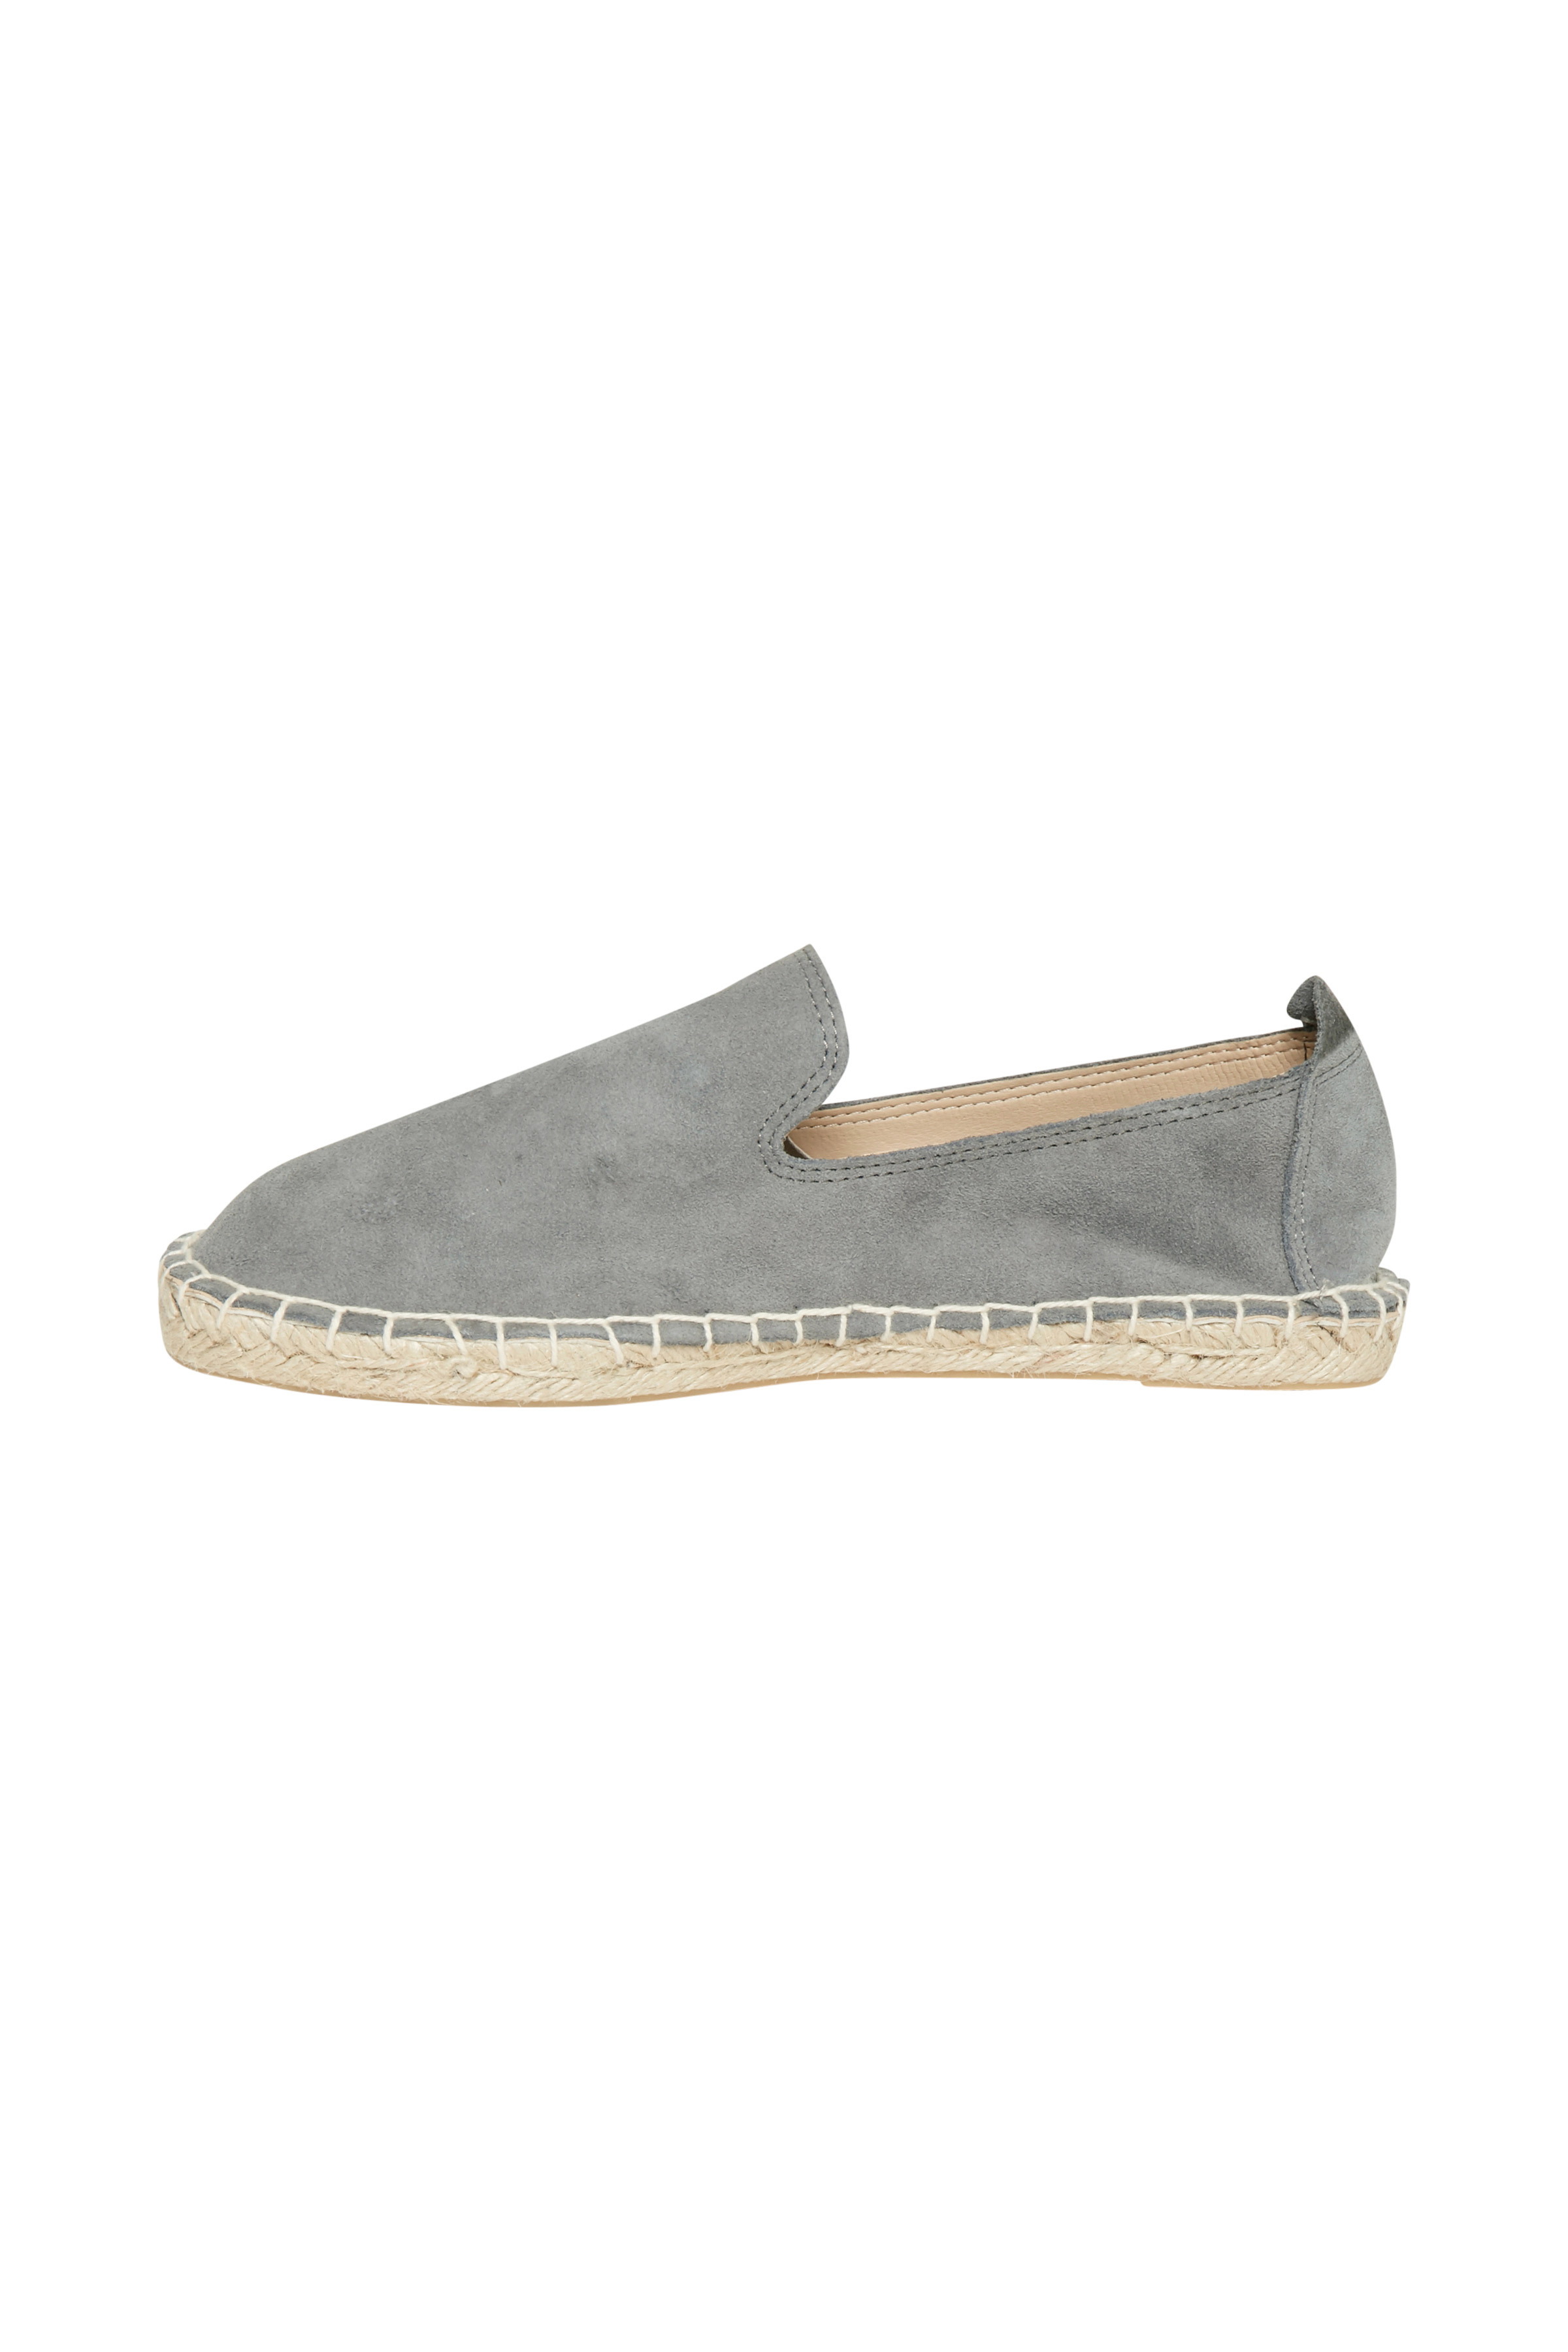 Grau Lederschuh von Ichi - accessories – Shoppen Sie Grau Lederschuh ab Gr. 36-42 hier